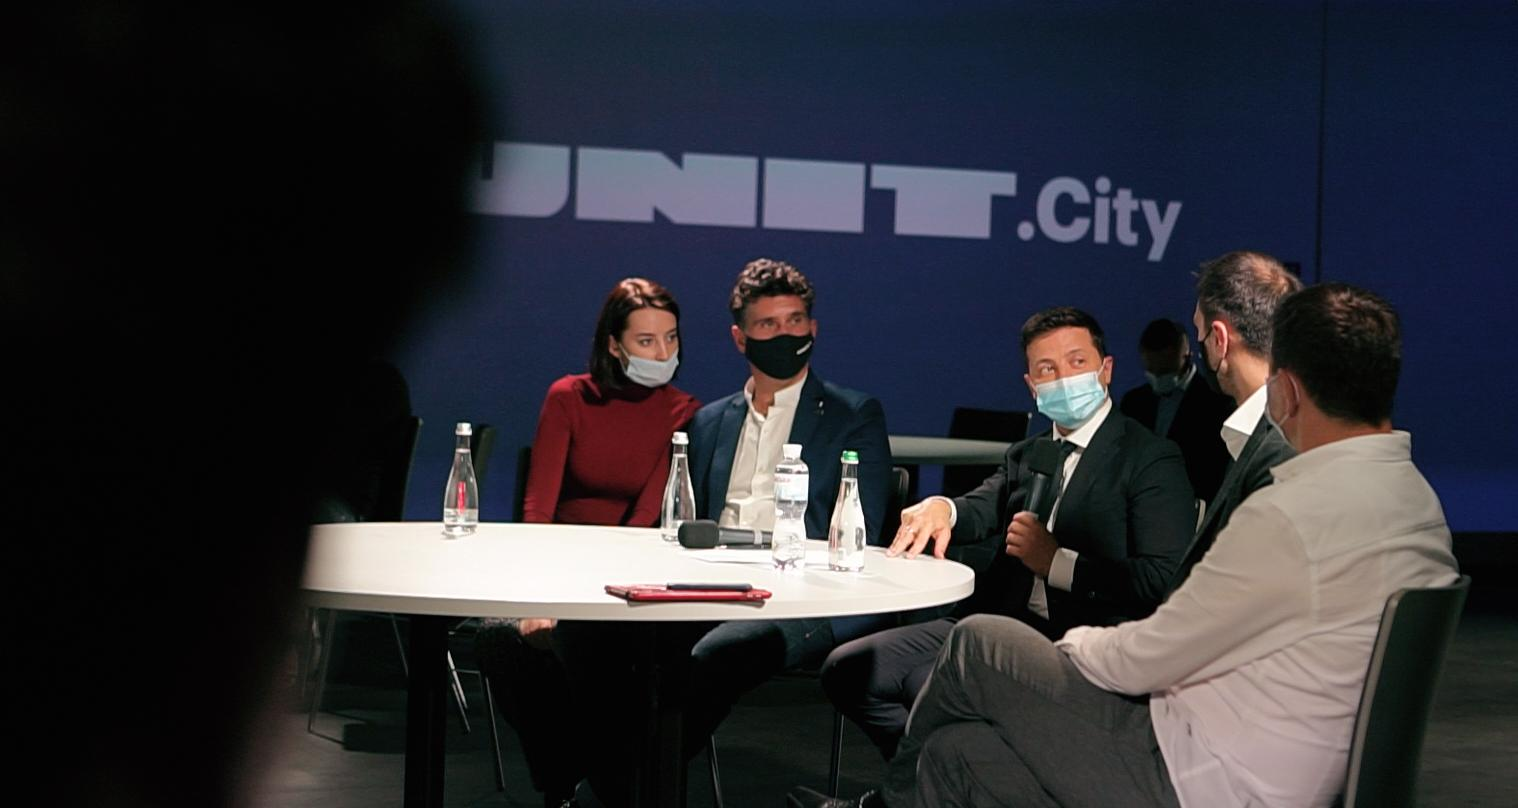 Владимир Зеленский на встрече со стартаперами UNIT.City